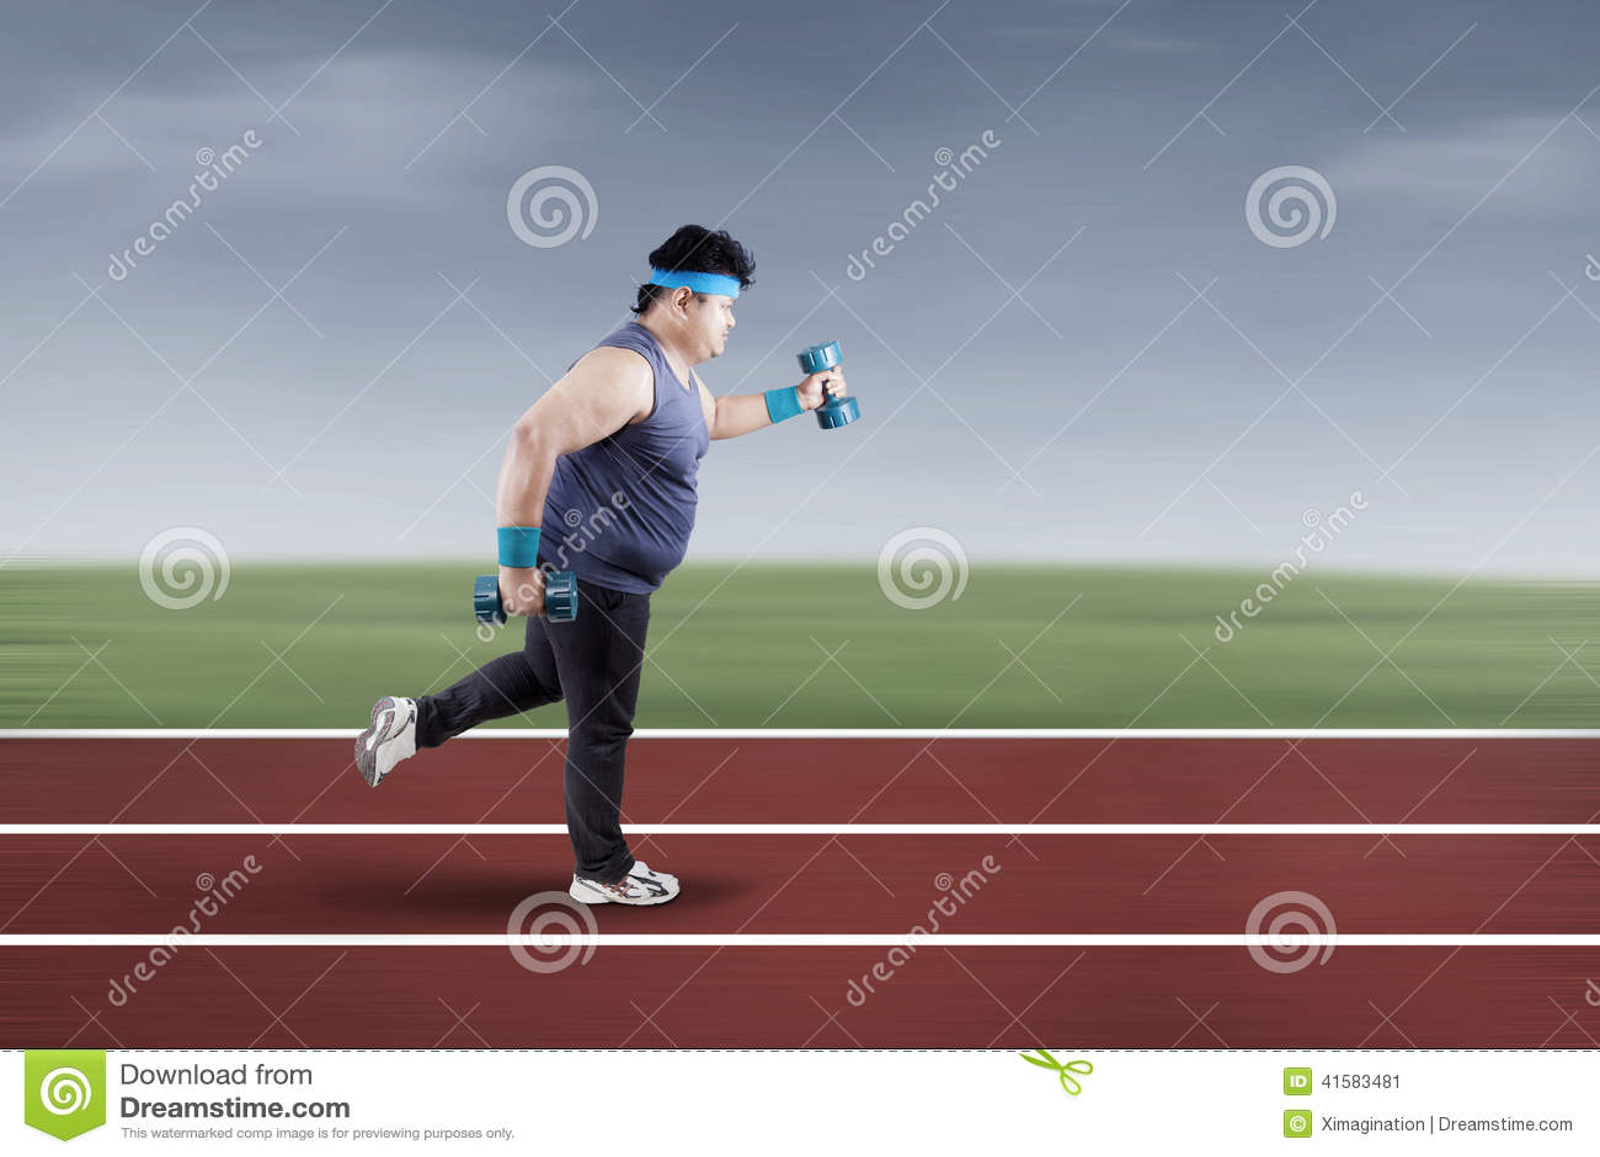 Fat Man Running On Track 1 Stock Photo - Image: 41583481